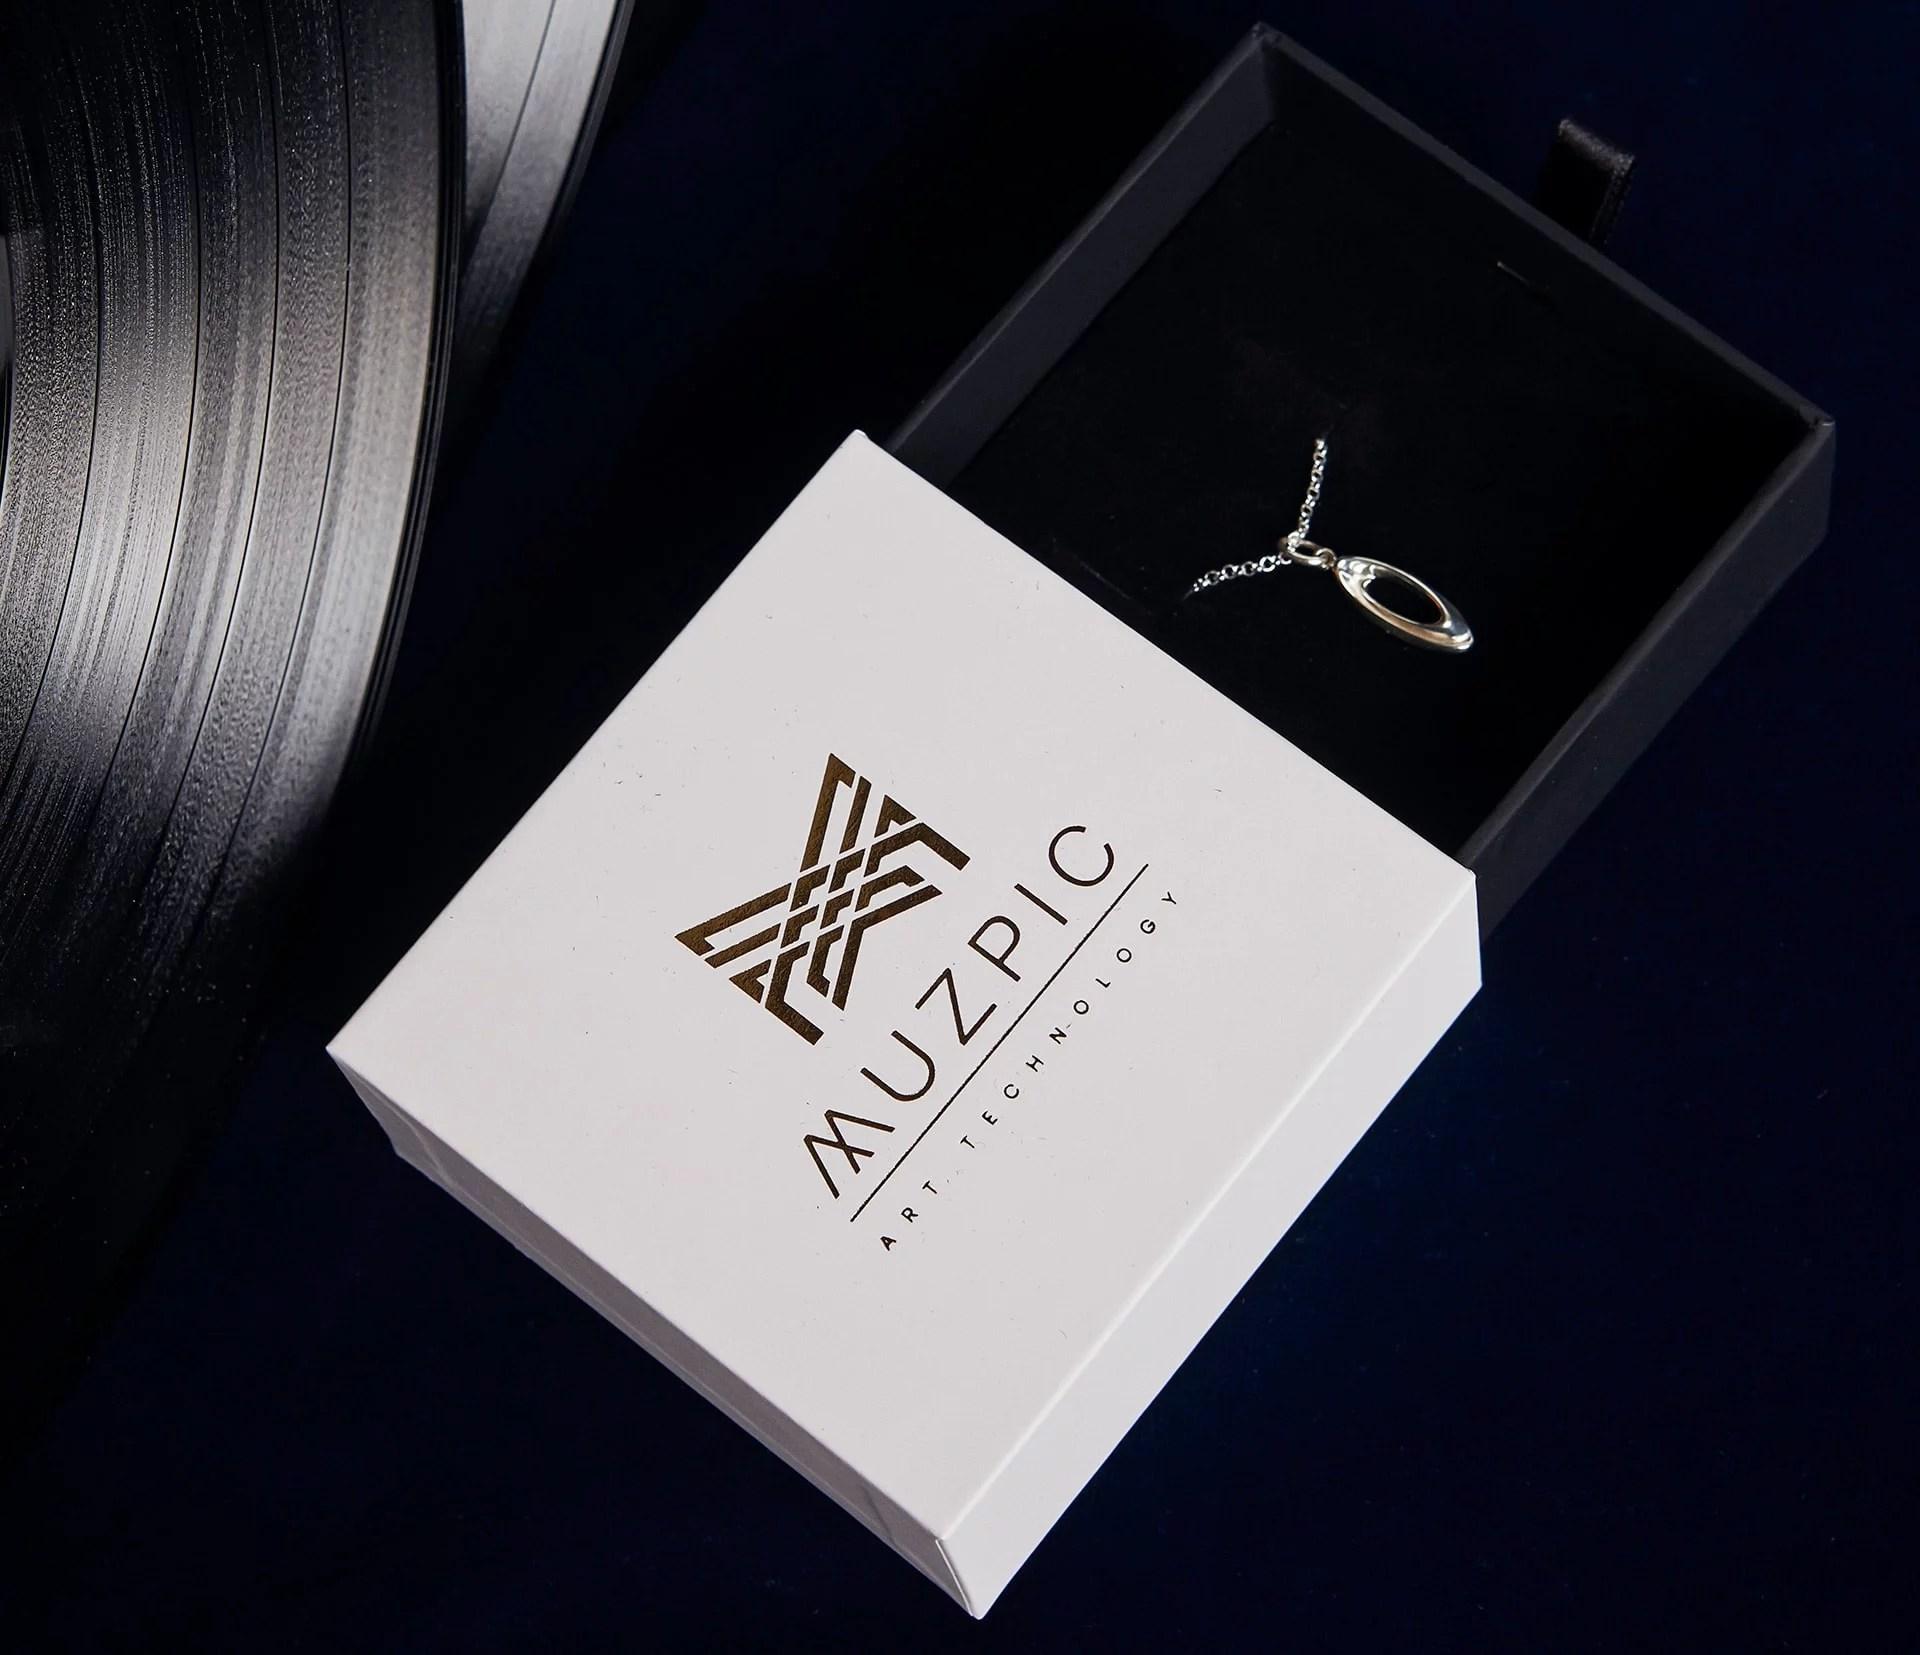 Regalo original pulsera de plata de primera ley personalizada en estuche de piel Muzpic.